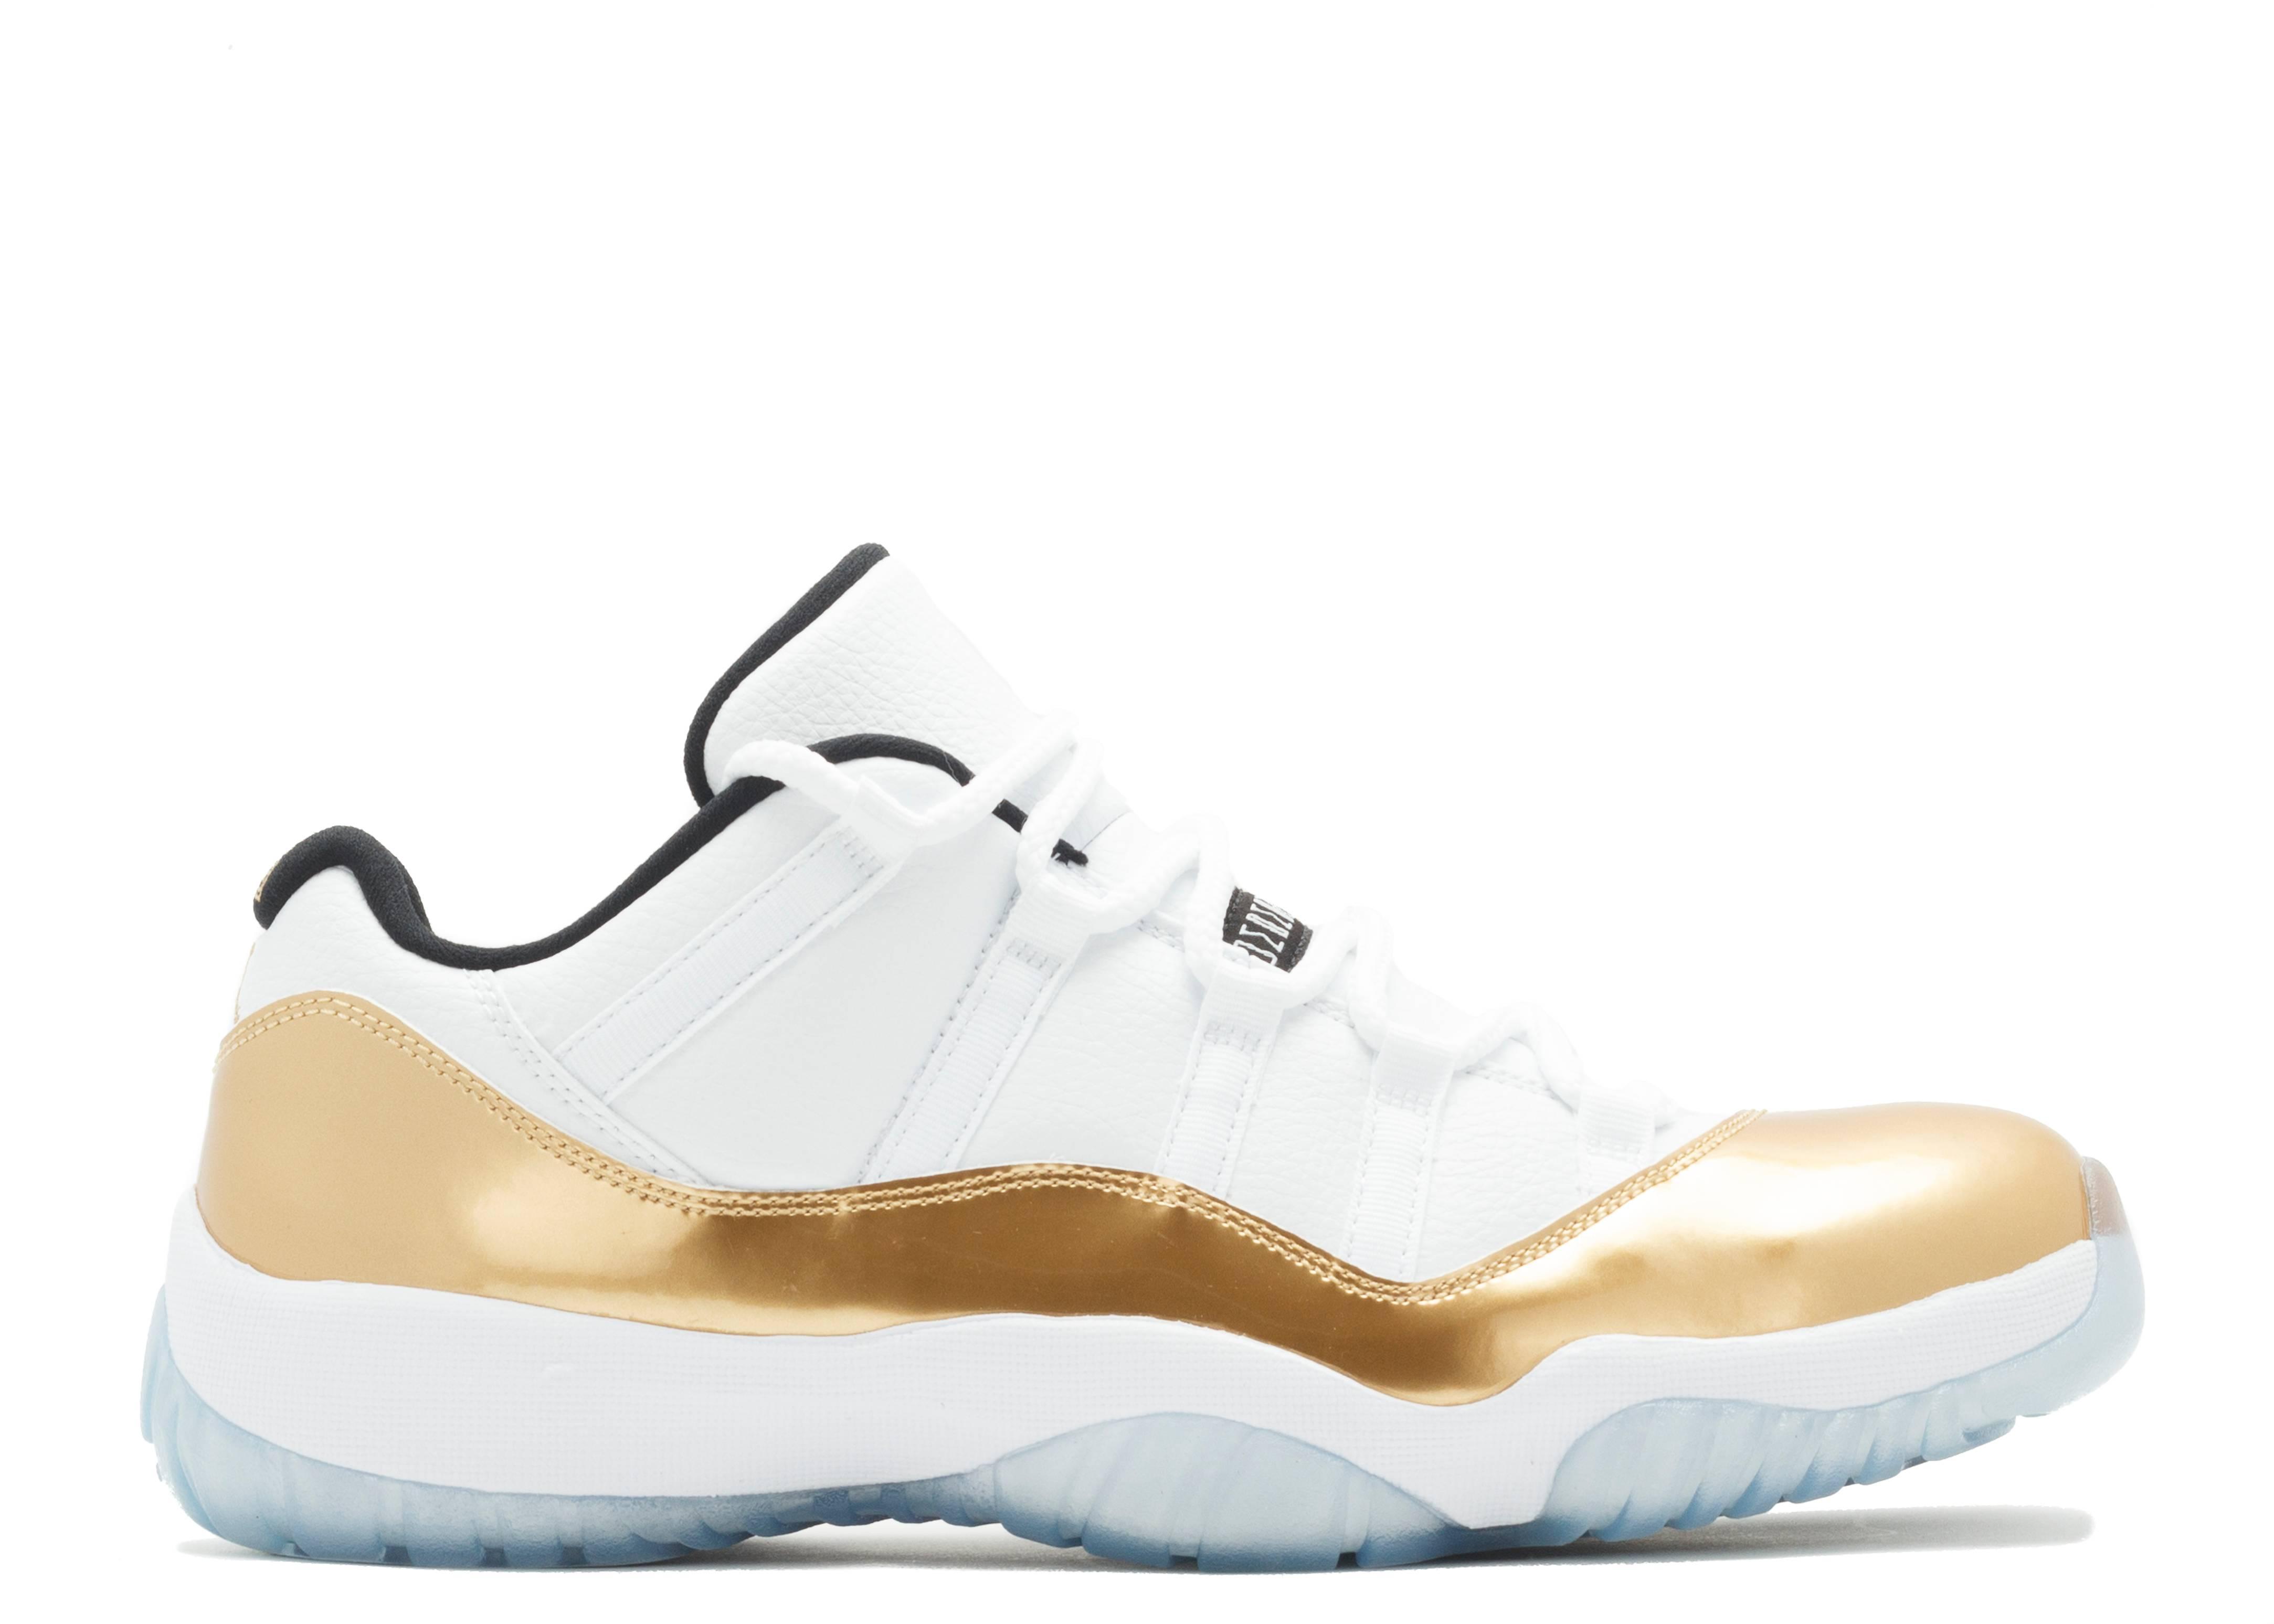 air jordan retro 11 gold white